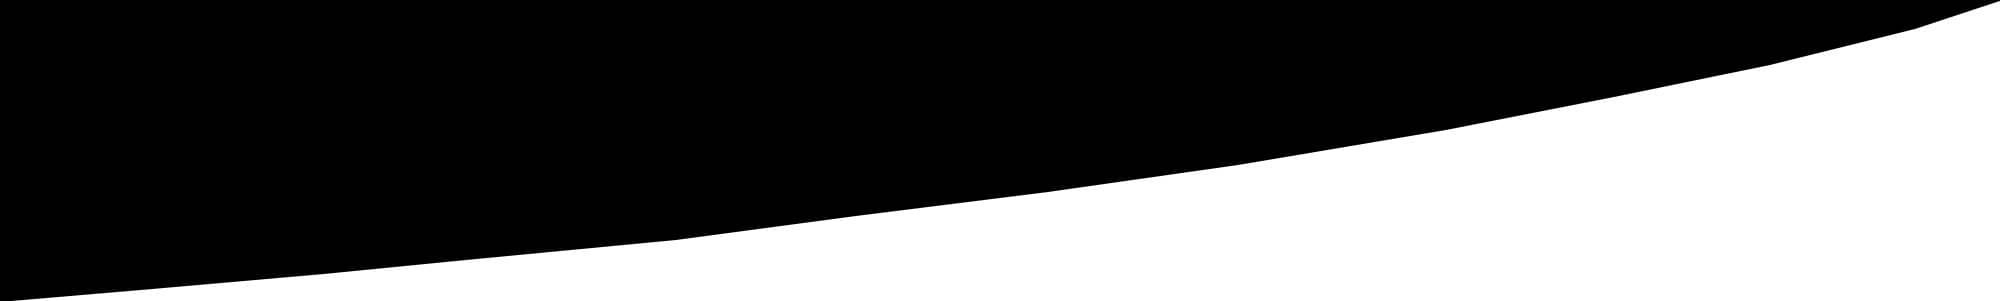 Kamatovic curve image